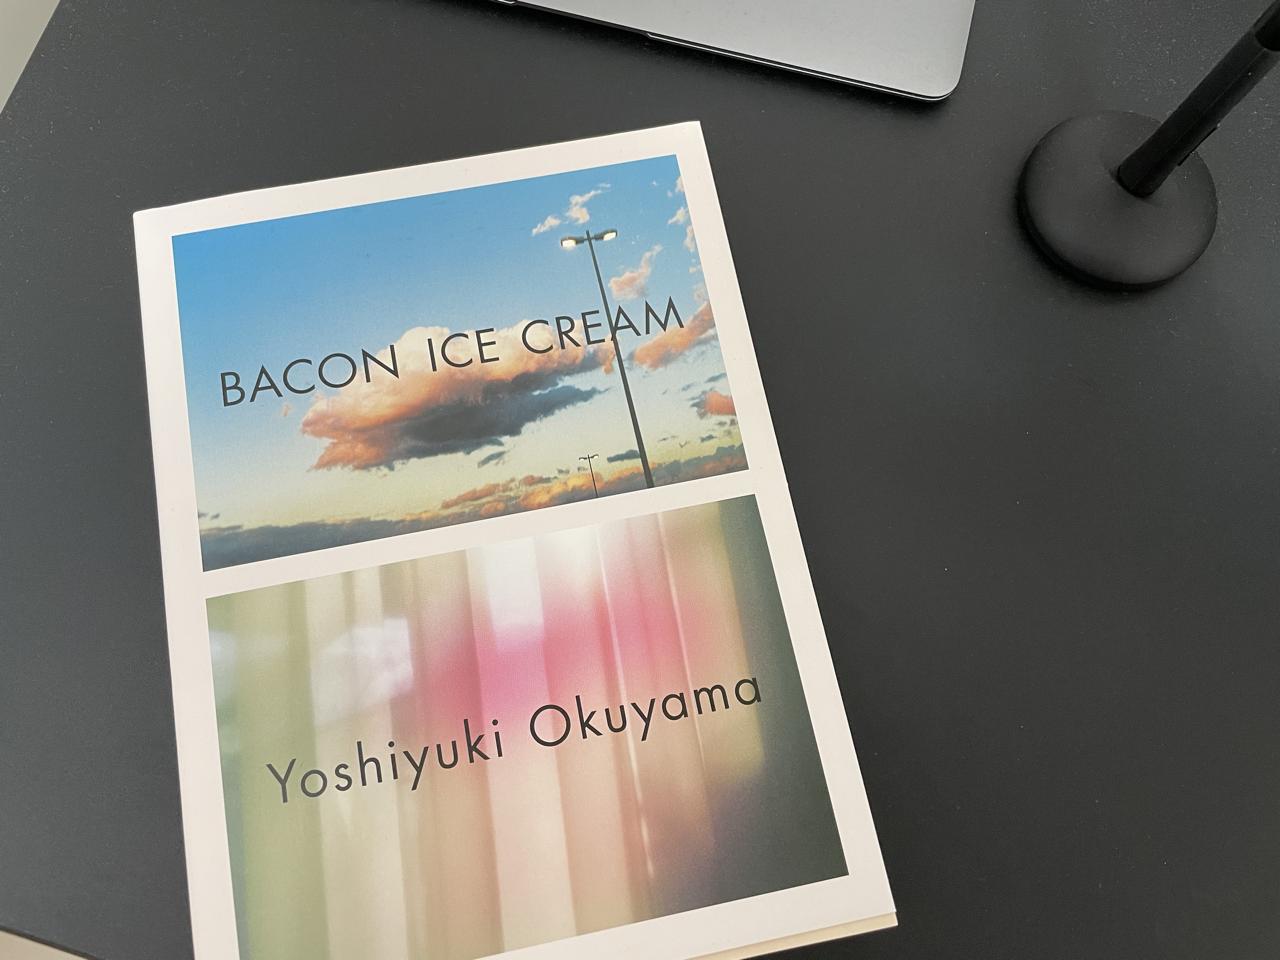 BACON ICE CREAMとエモいさま